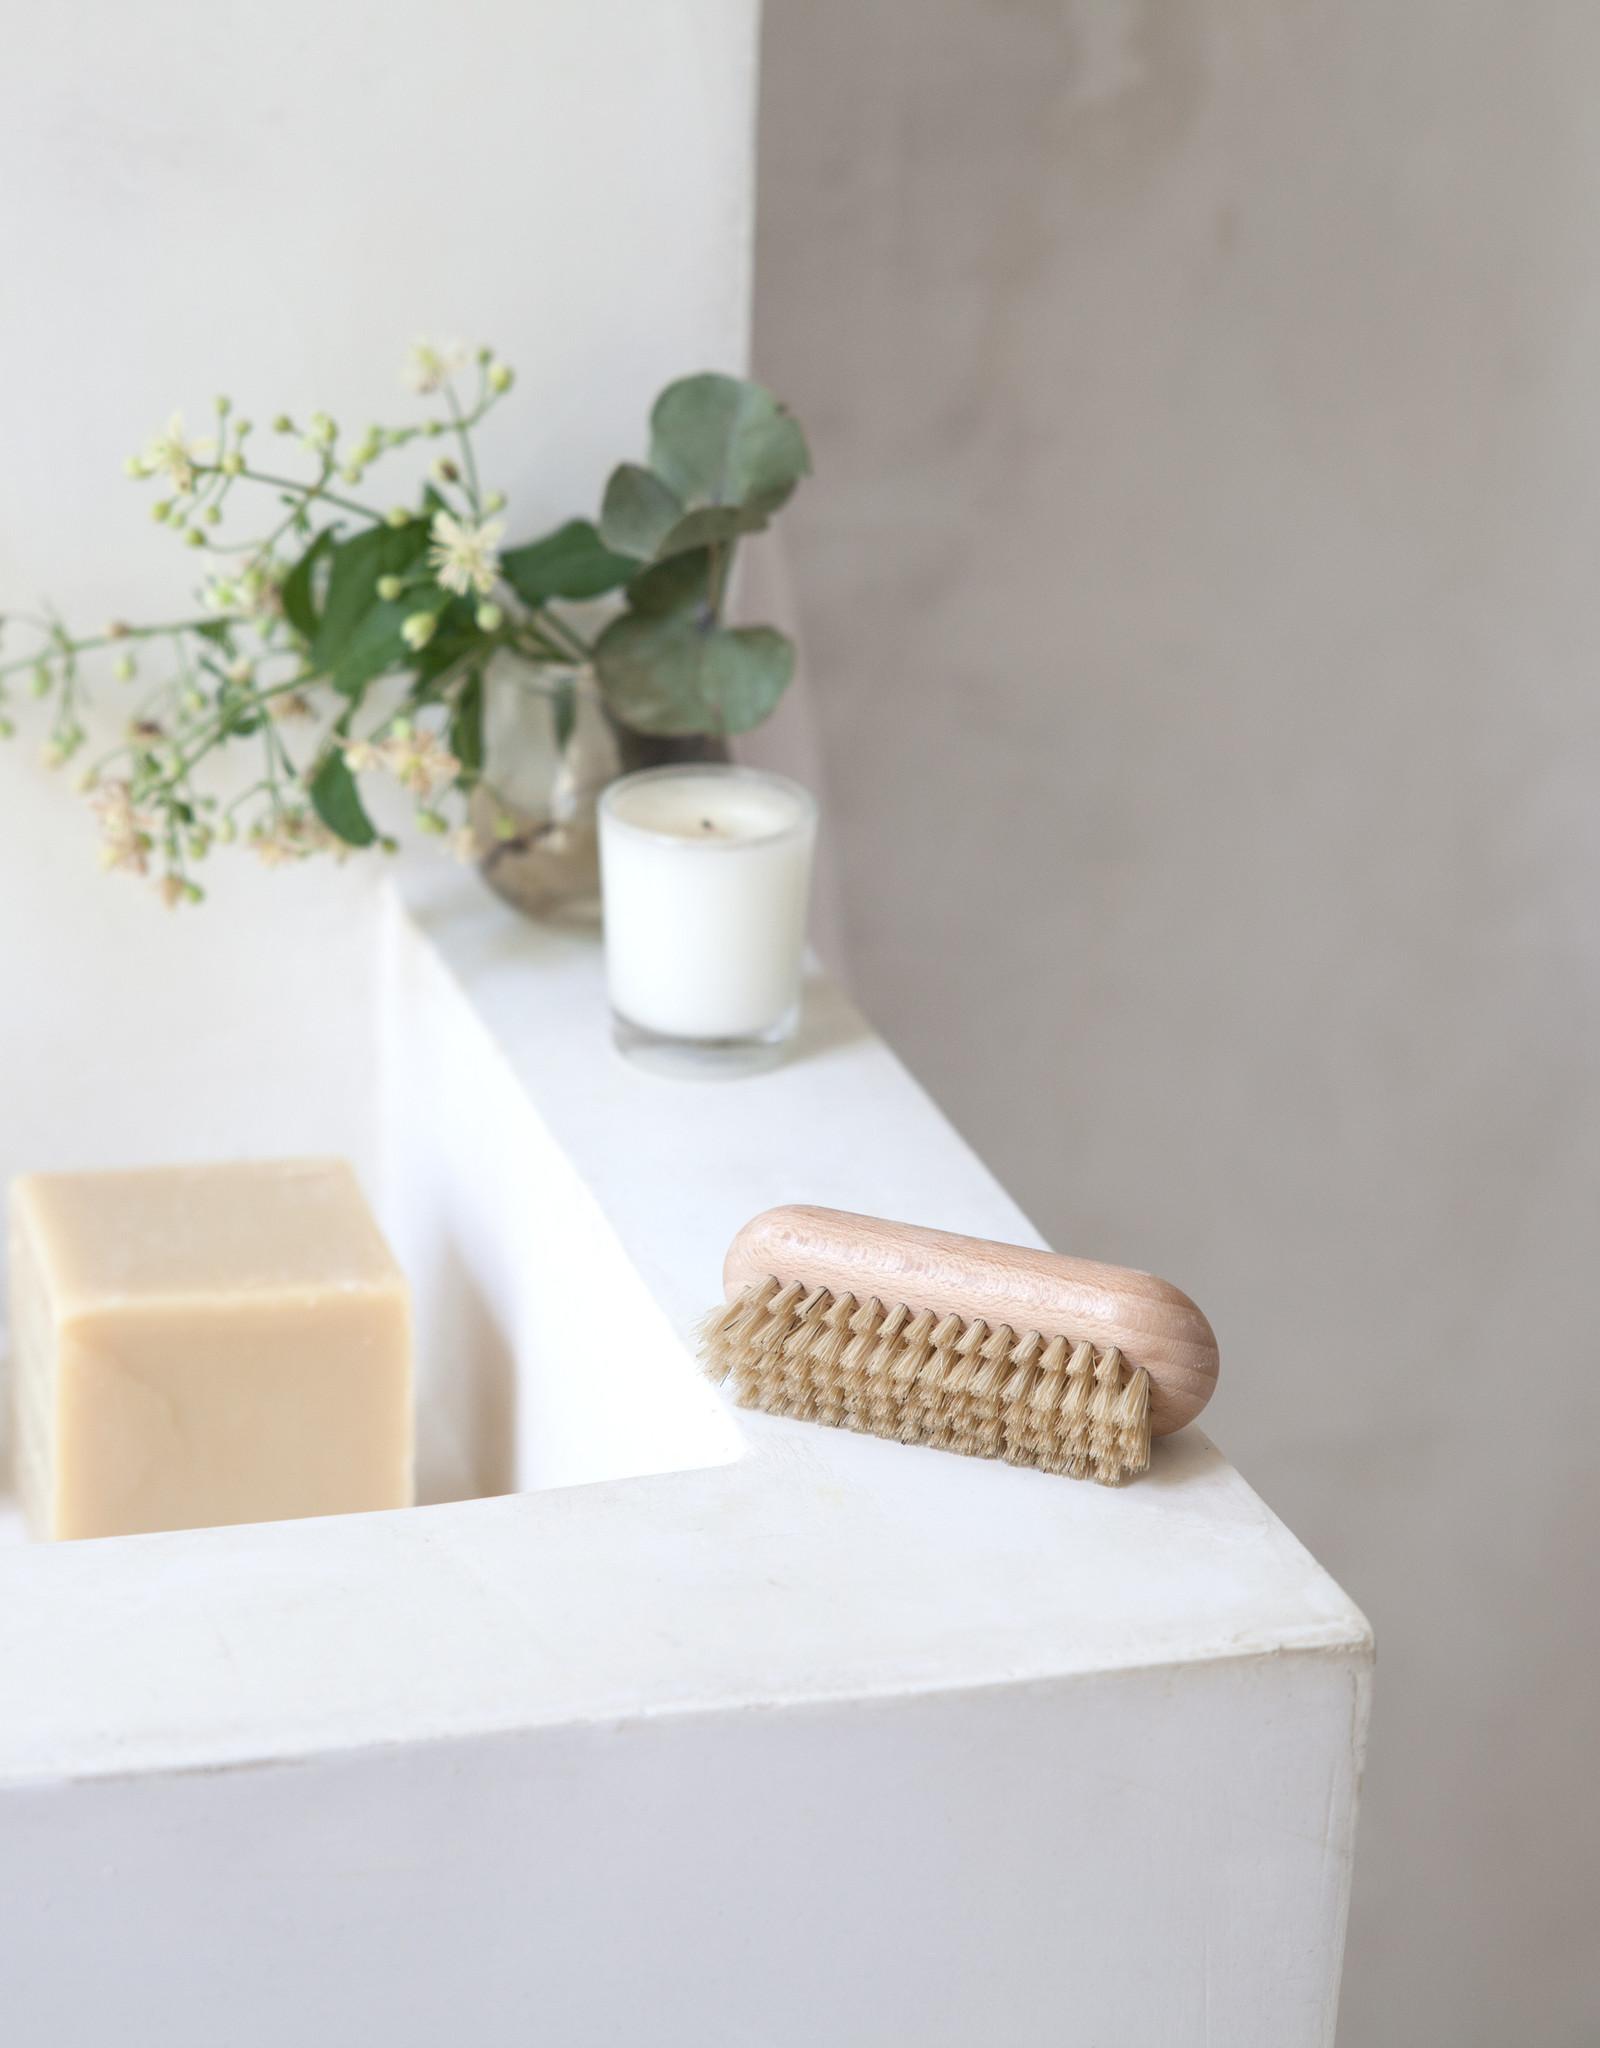 Set zeephouder + Marseille zeep + nagelborstel